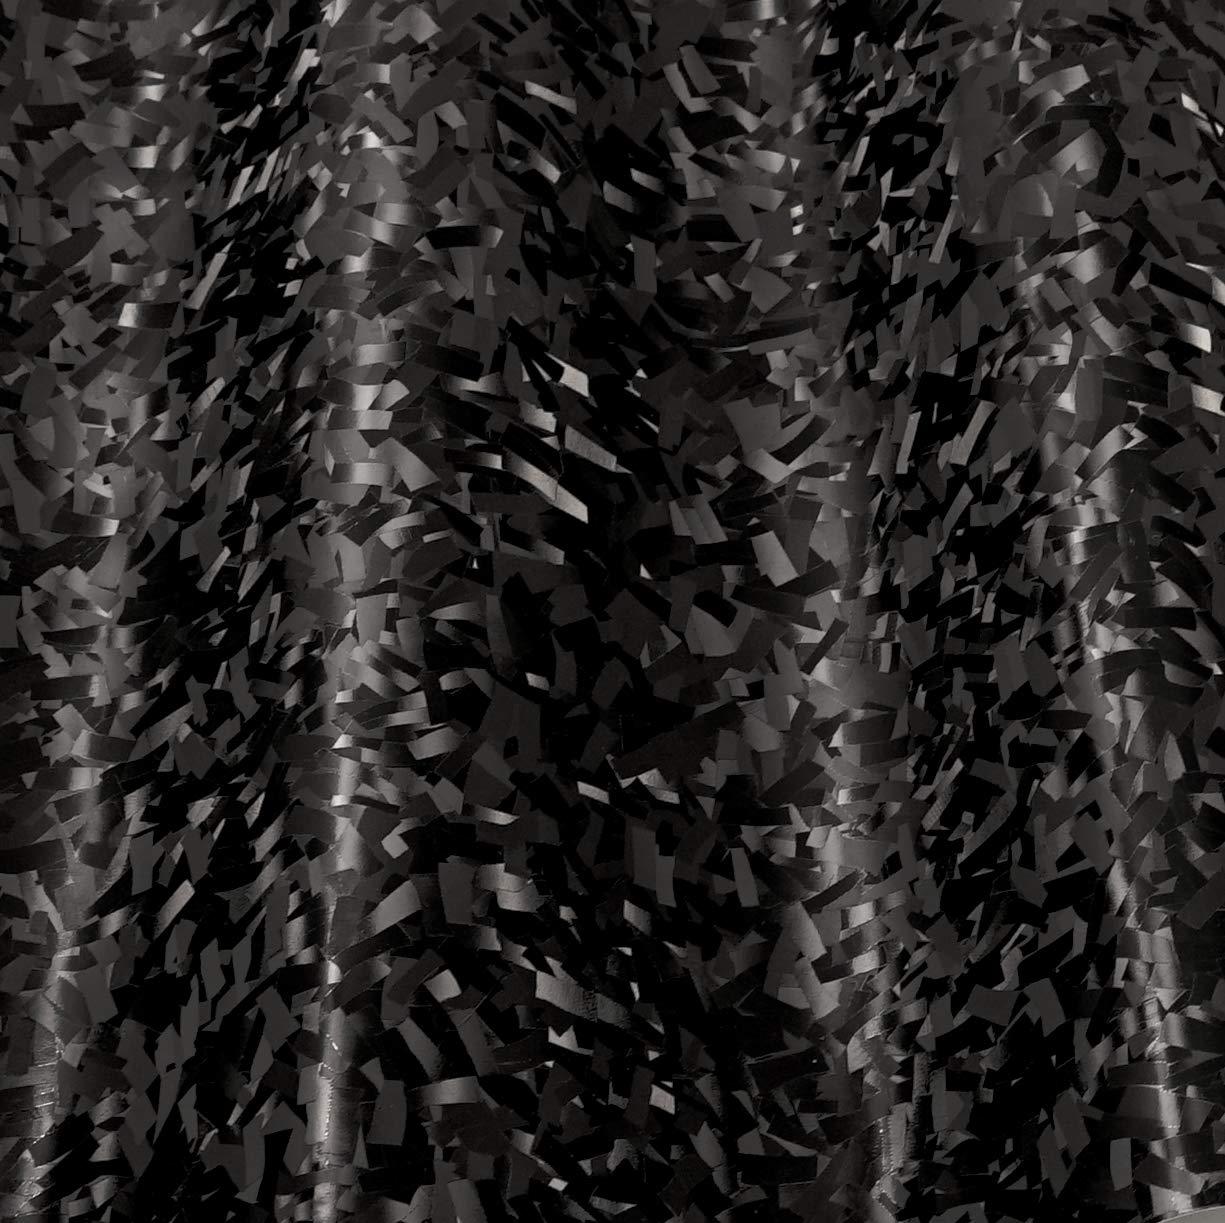 VViViD 2020 Edition Forged Black Composite Carbon Vinyl Wrap Roll 1ft x 5ft